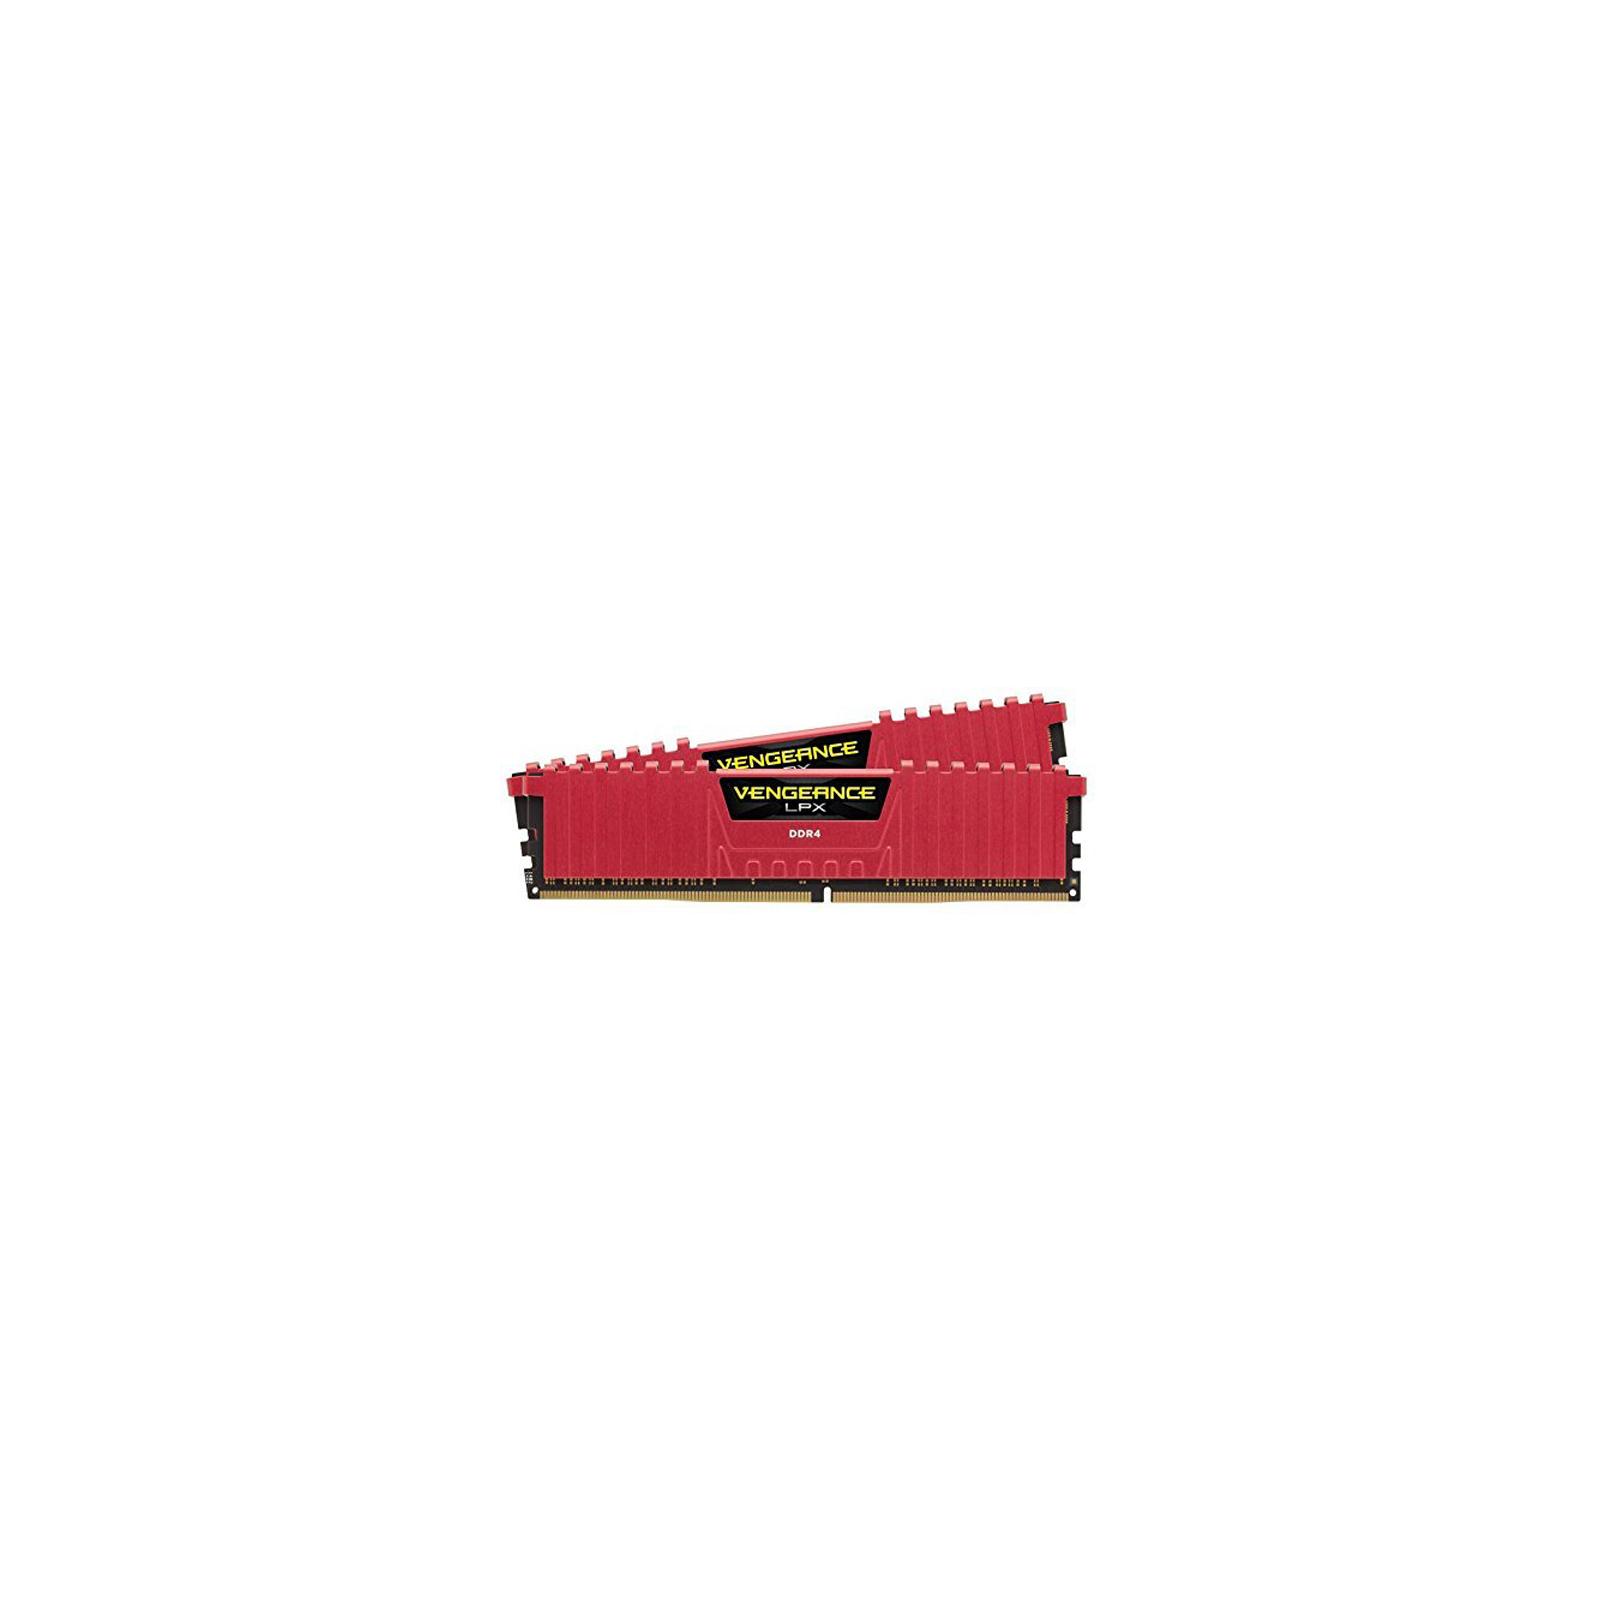 Модуль памяти для компьютера DDR4 16GB (2x8GB) 3000 MHz Vengeance LPX Red CORSAIR (CMK16GX4M2B3000C15R) изображение 2